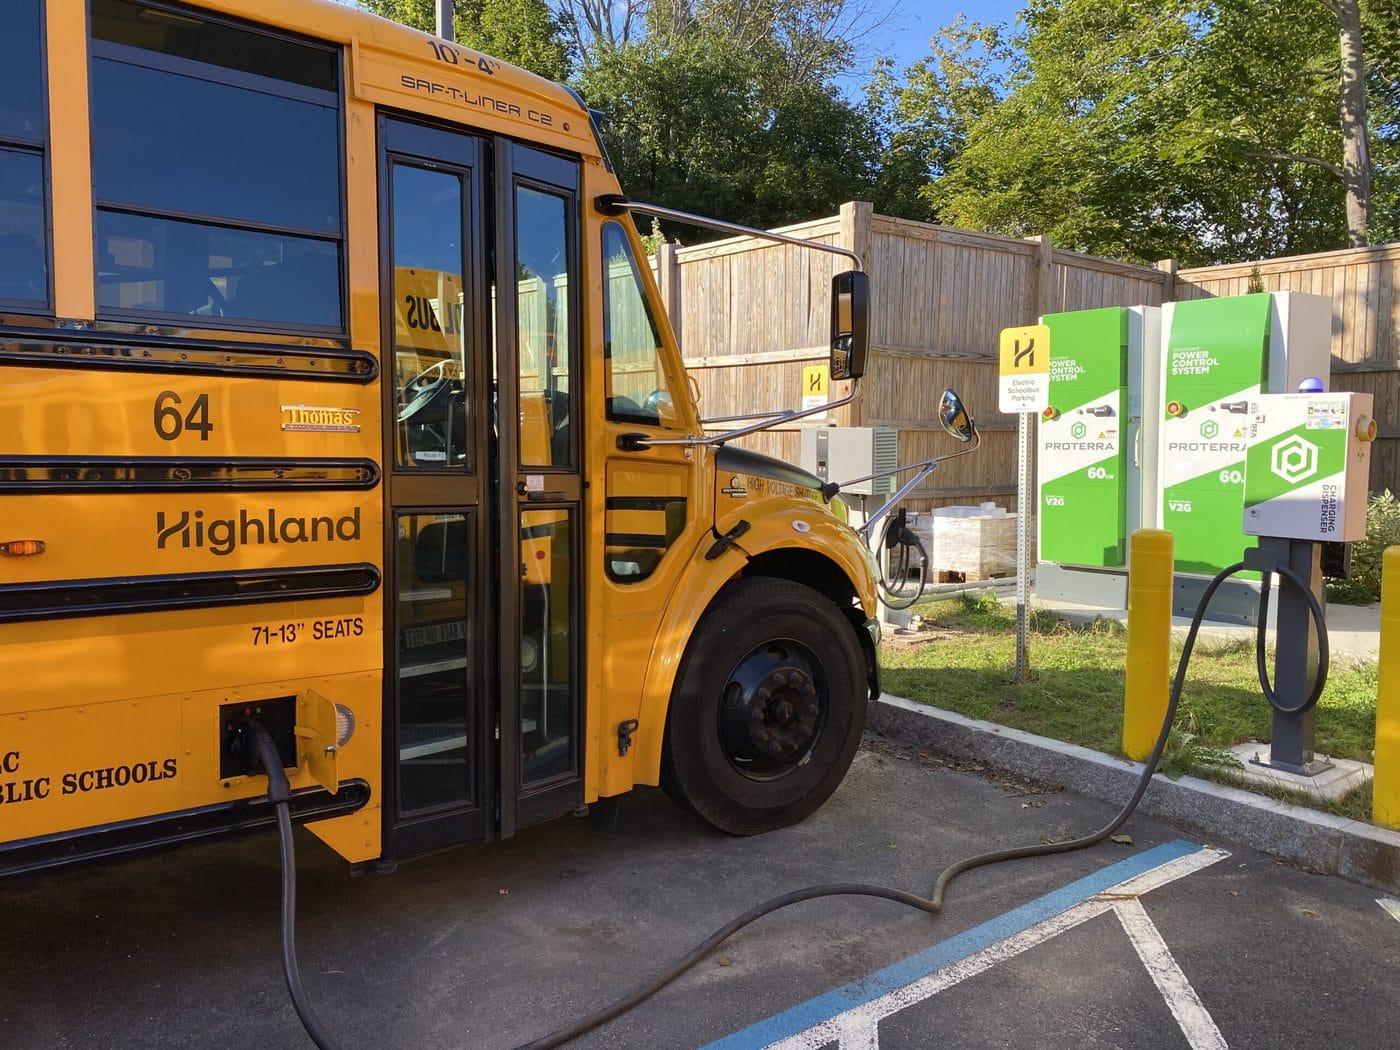 Beverly Public Schools Electric School Bus Marissa Oct 2021 1.Jpg Scaled